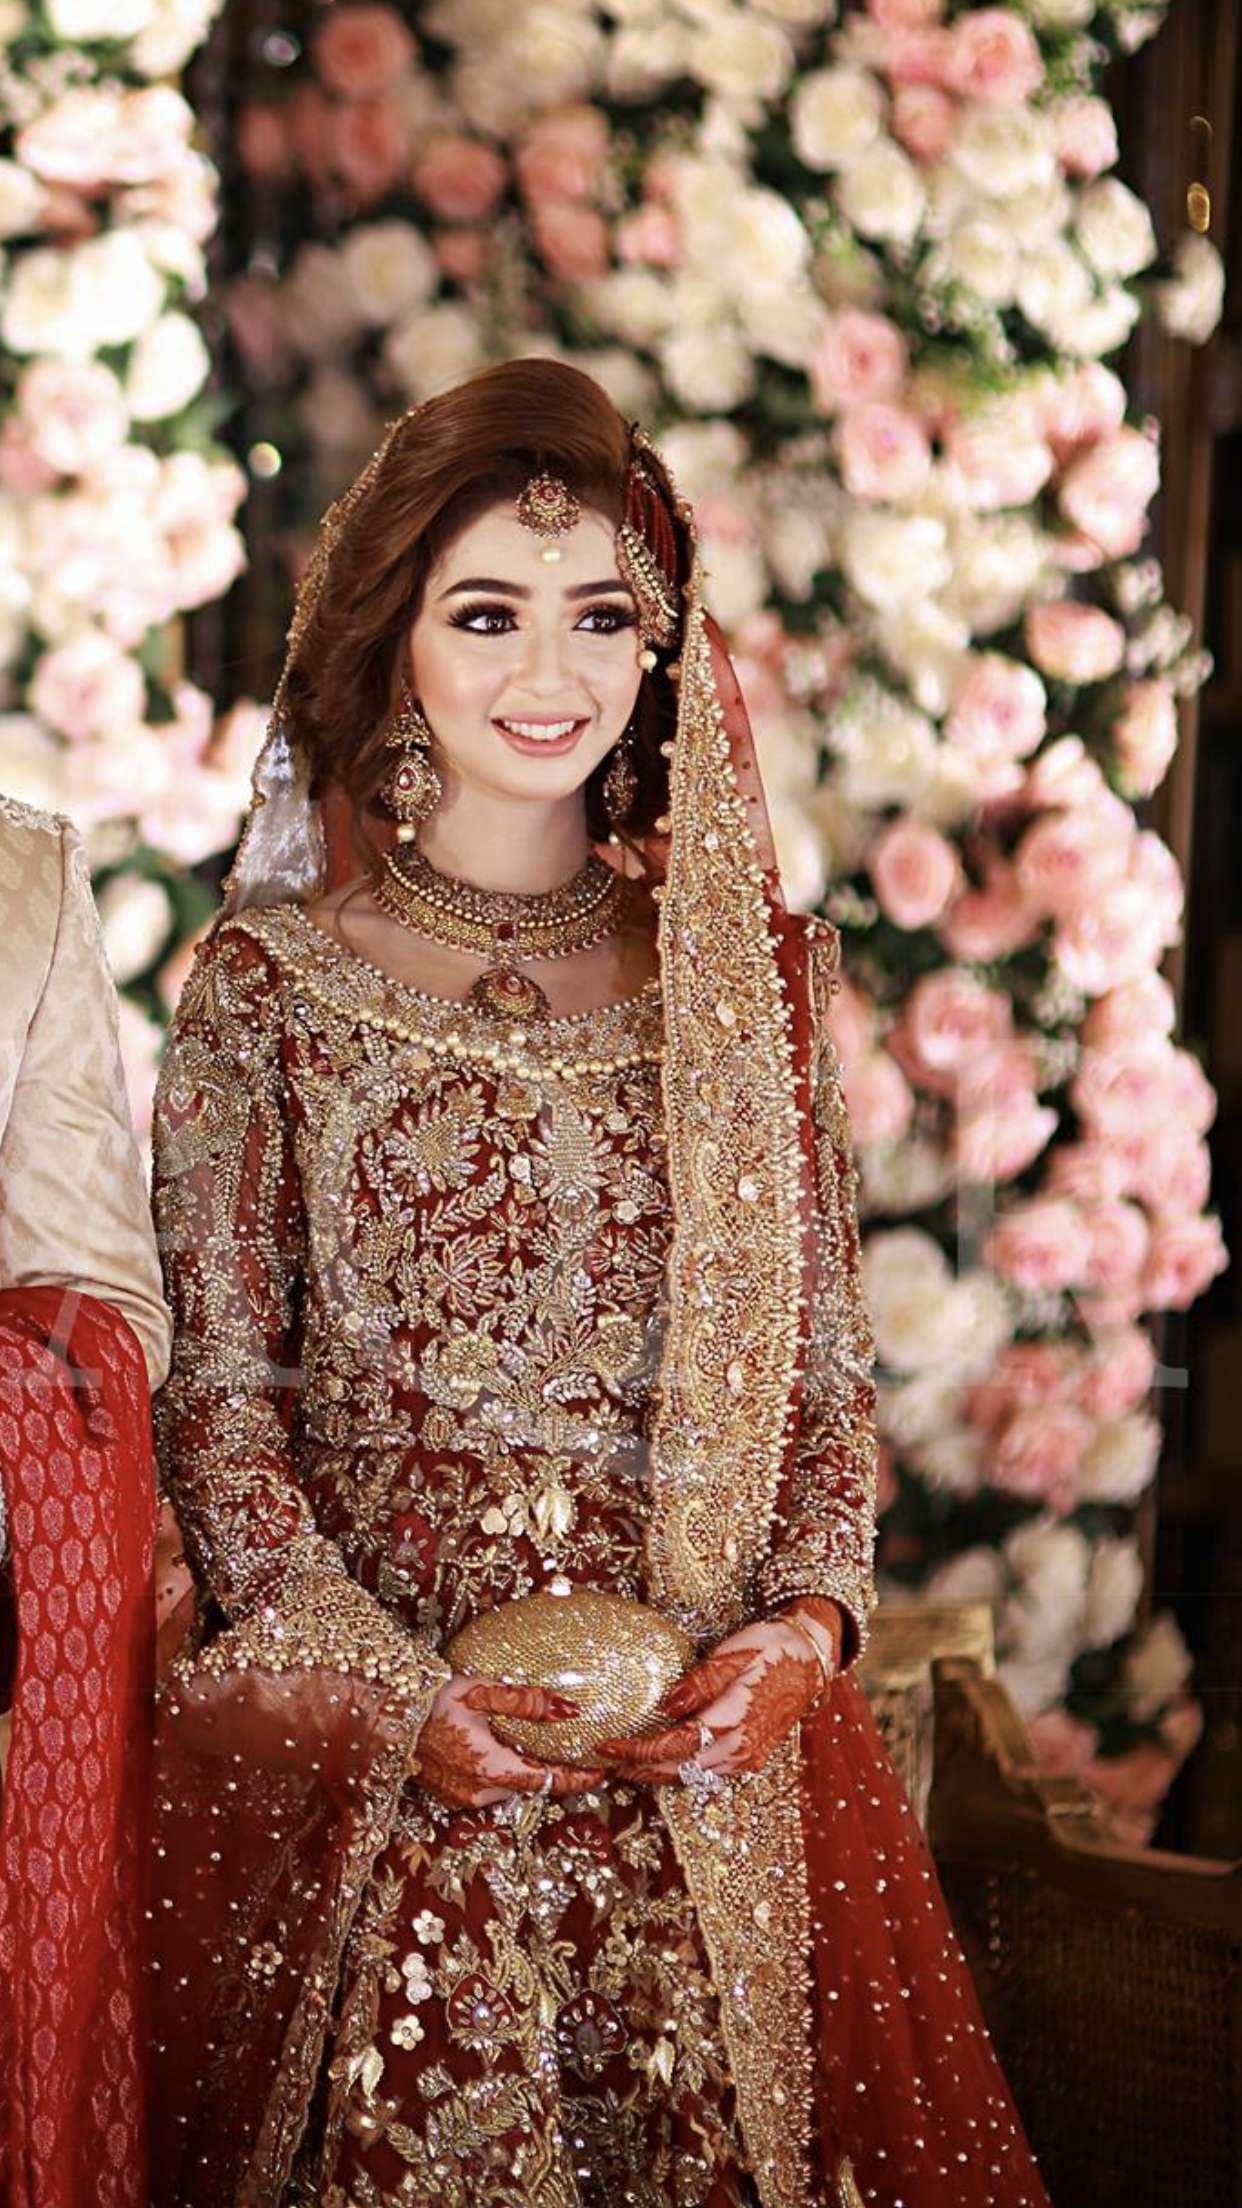 barat bride | cultural in 2019 | pakistani wedding dresses